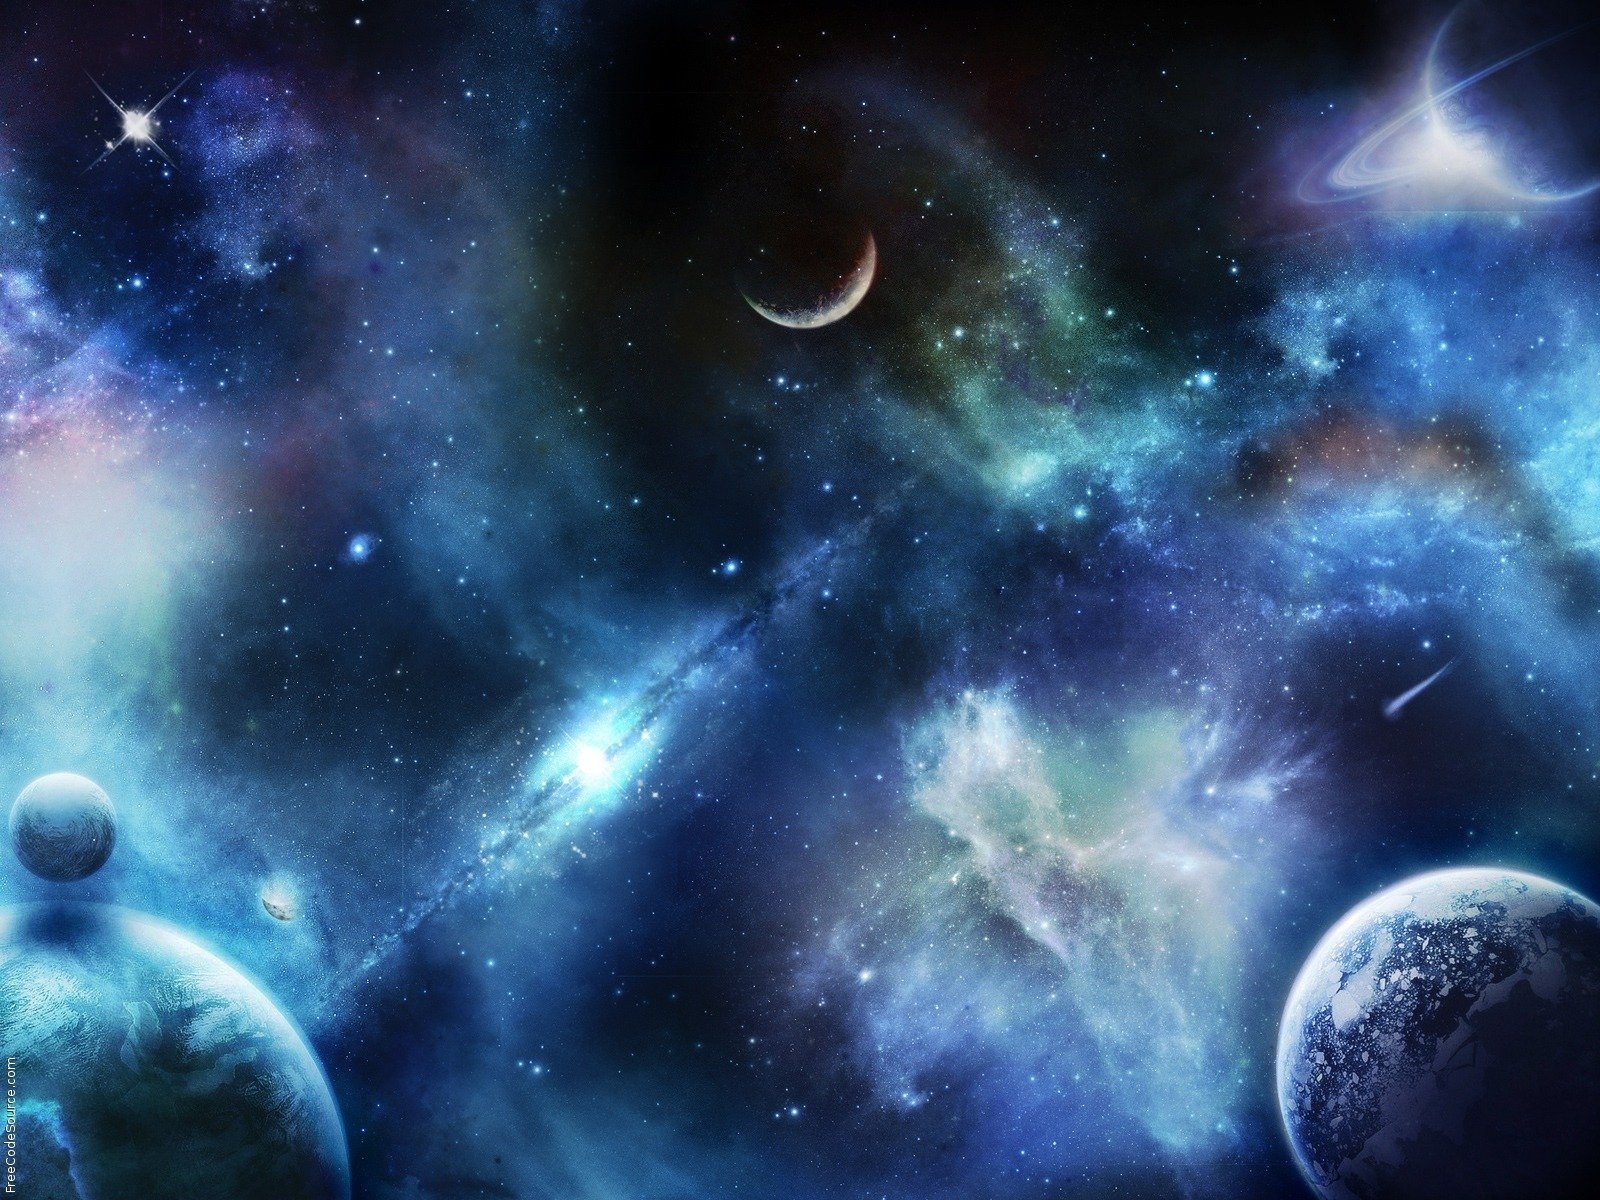 Animated Galaxy Wallpaper - WallpaperSafari | 1600 x 1200 jpeg 548kB